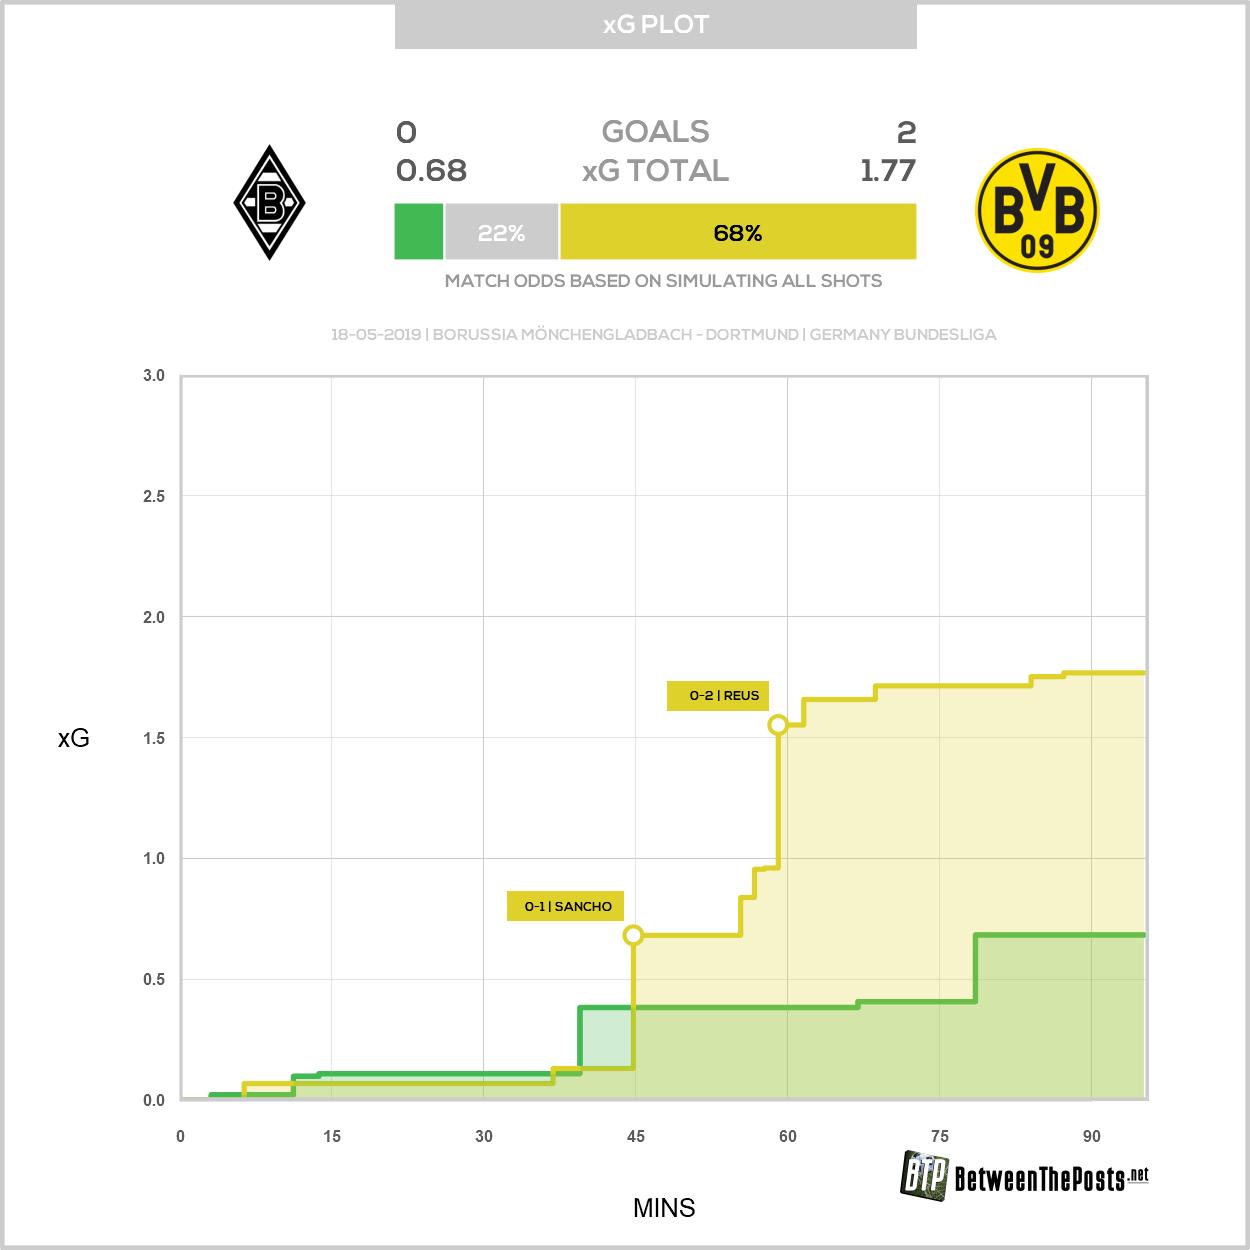 Expected goals plot Borussia Mönchengladbach Borussia Dortmund 0-2 Bundesliga